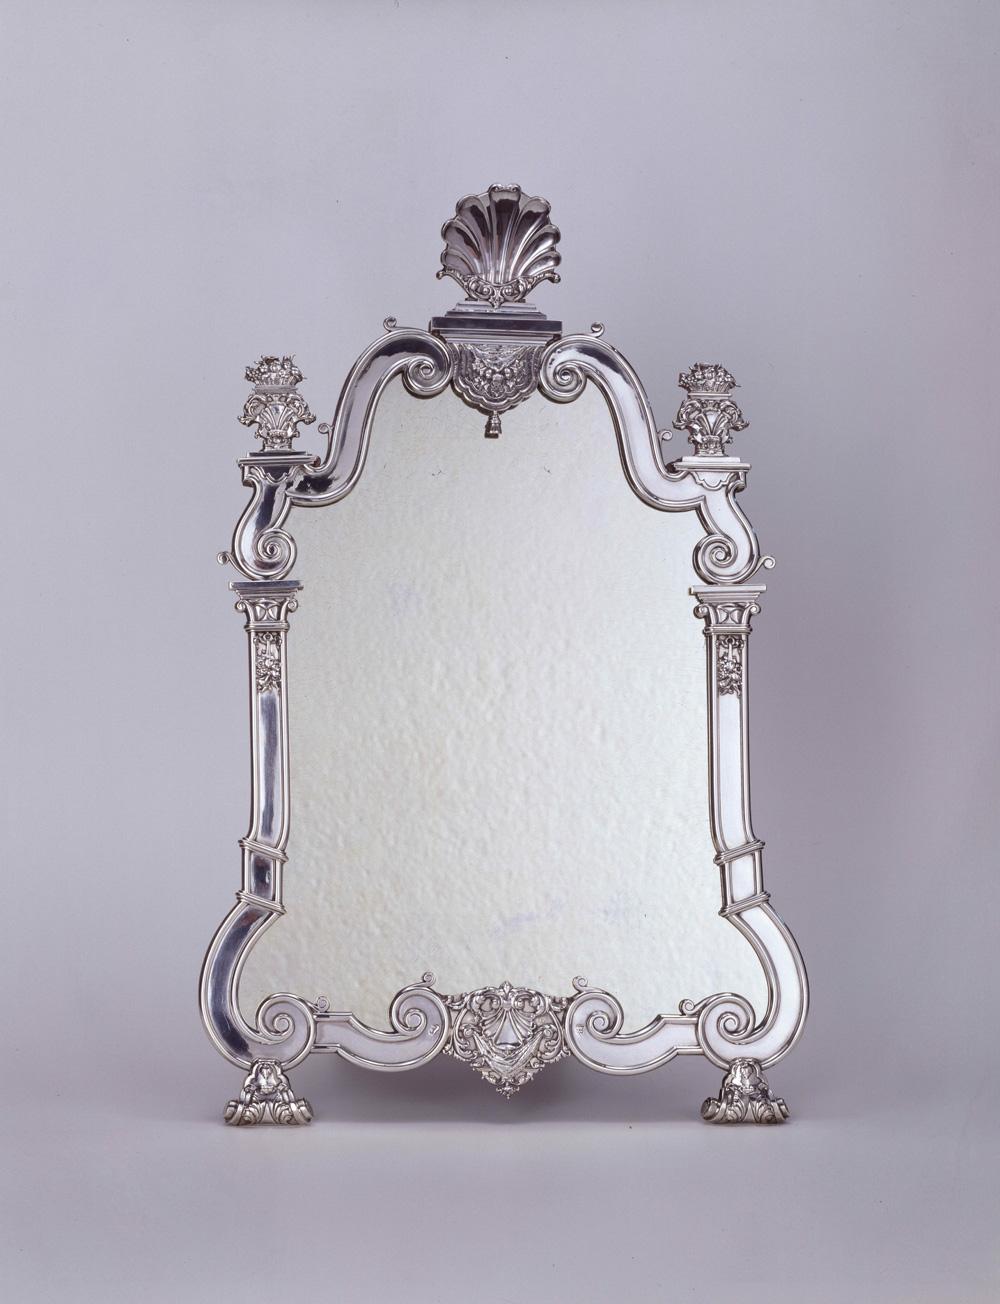 Fig. 6 Hendrik Fortman (1715-1807), Toilet Mirror, 1750Museum De Lakenhal, Leiden, inv. no. 9036